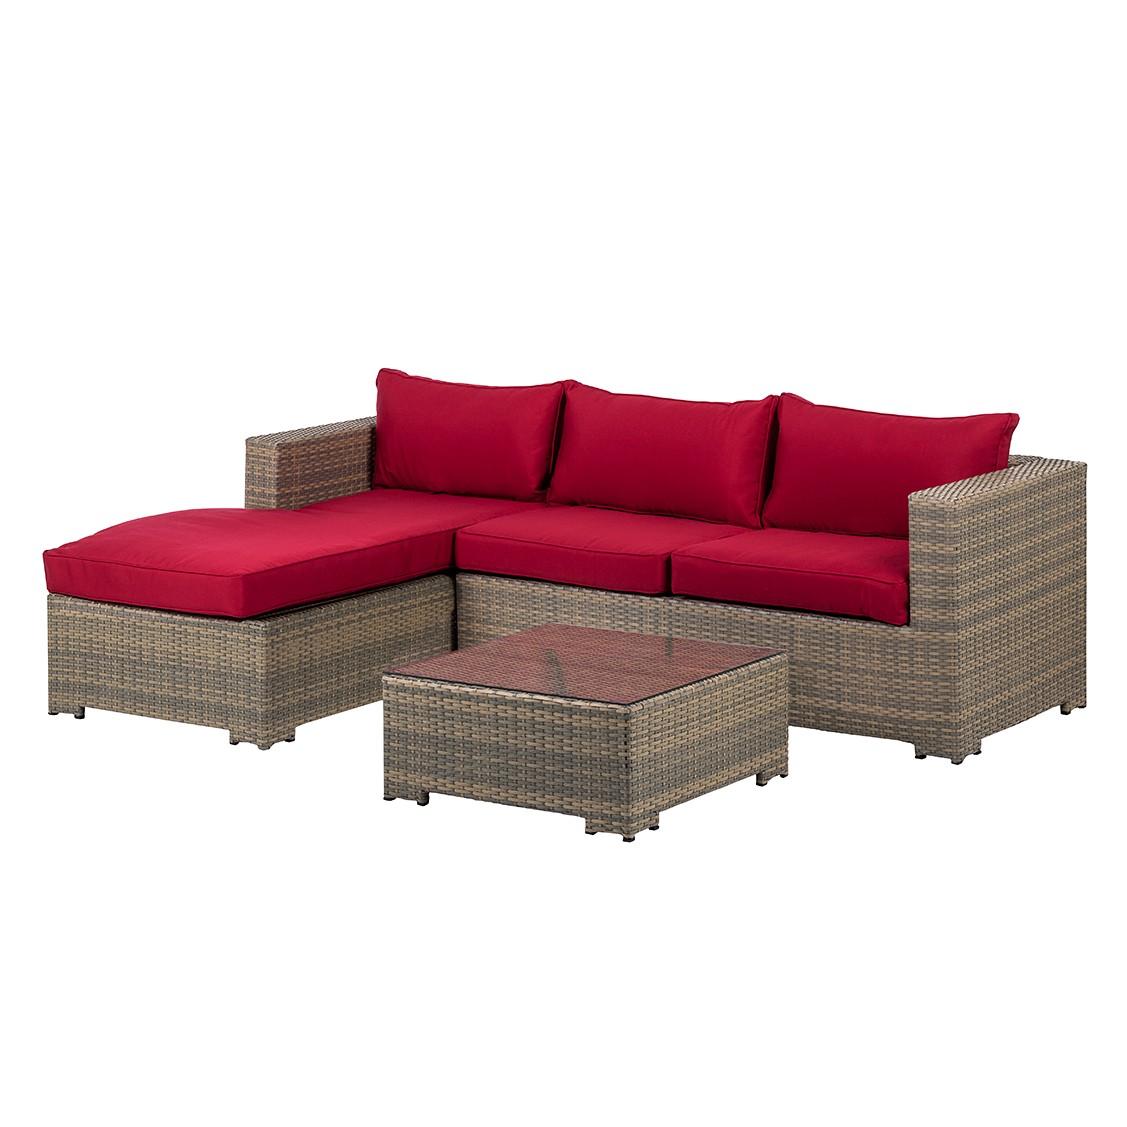 Loungesofa Paradise Lounge II (2-teilig) - Braun / Rot, Kings Garden